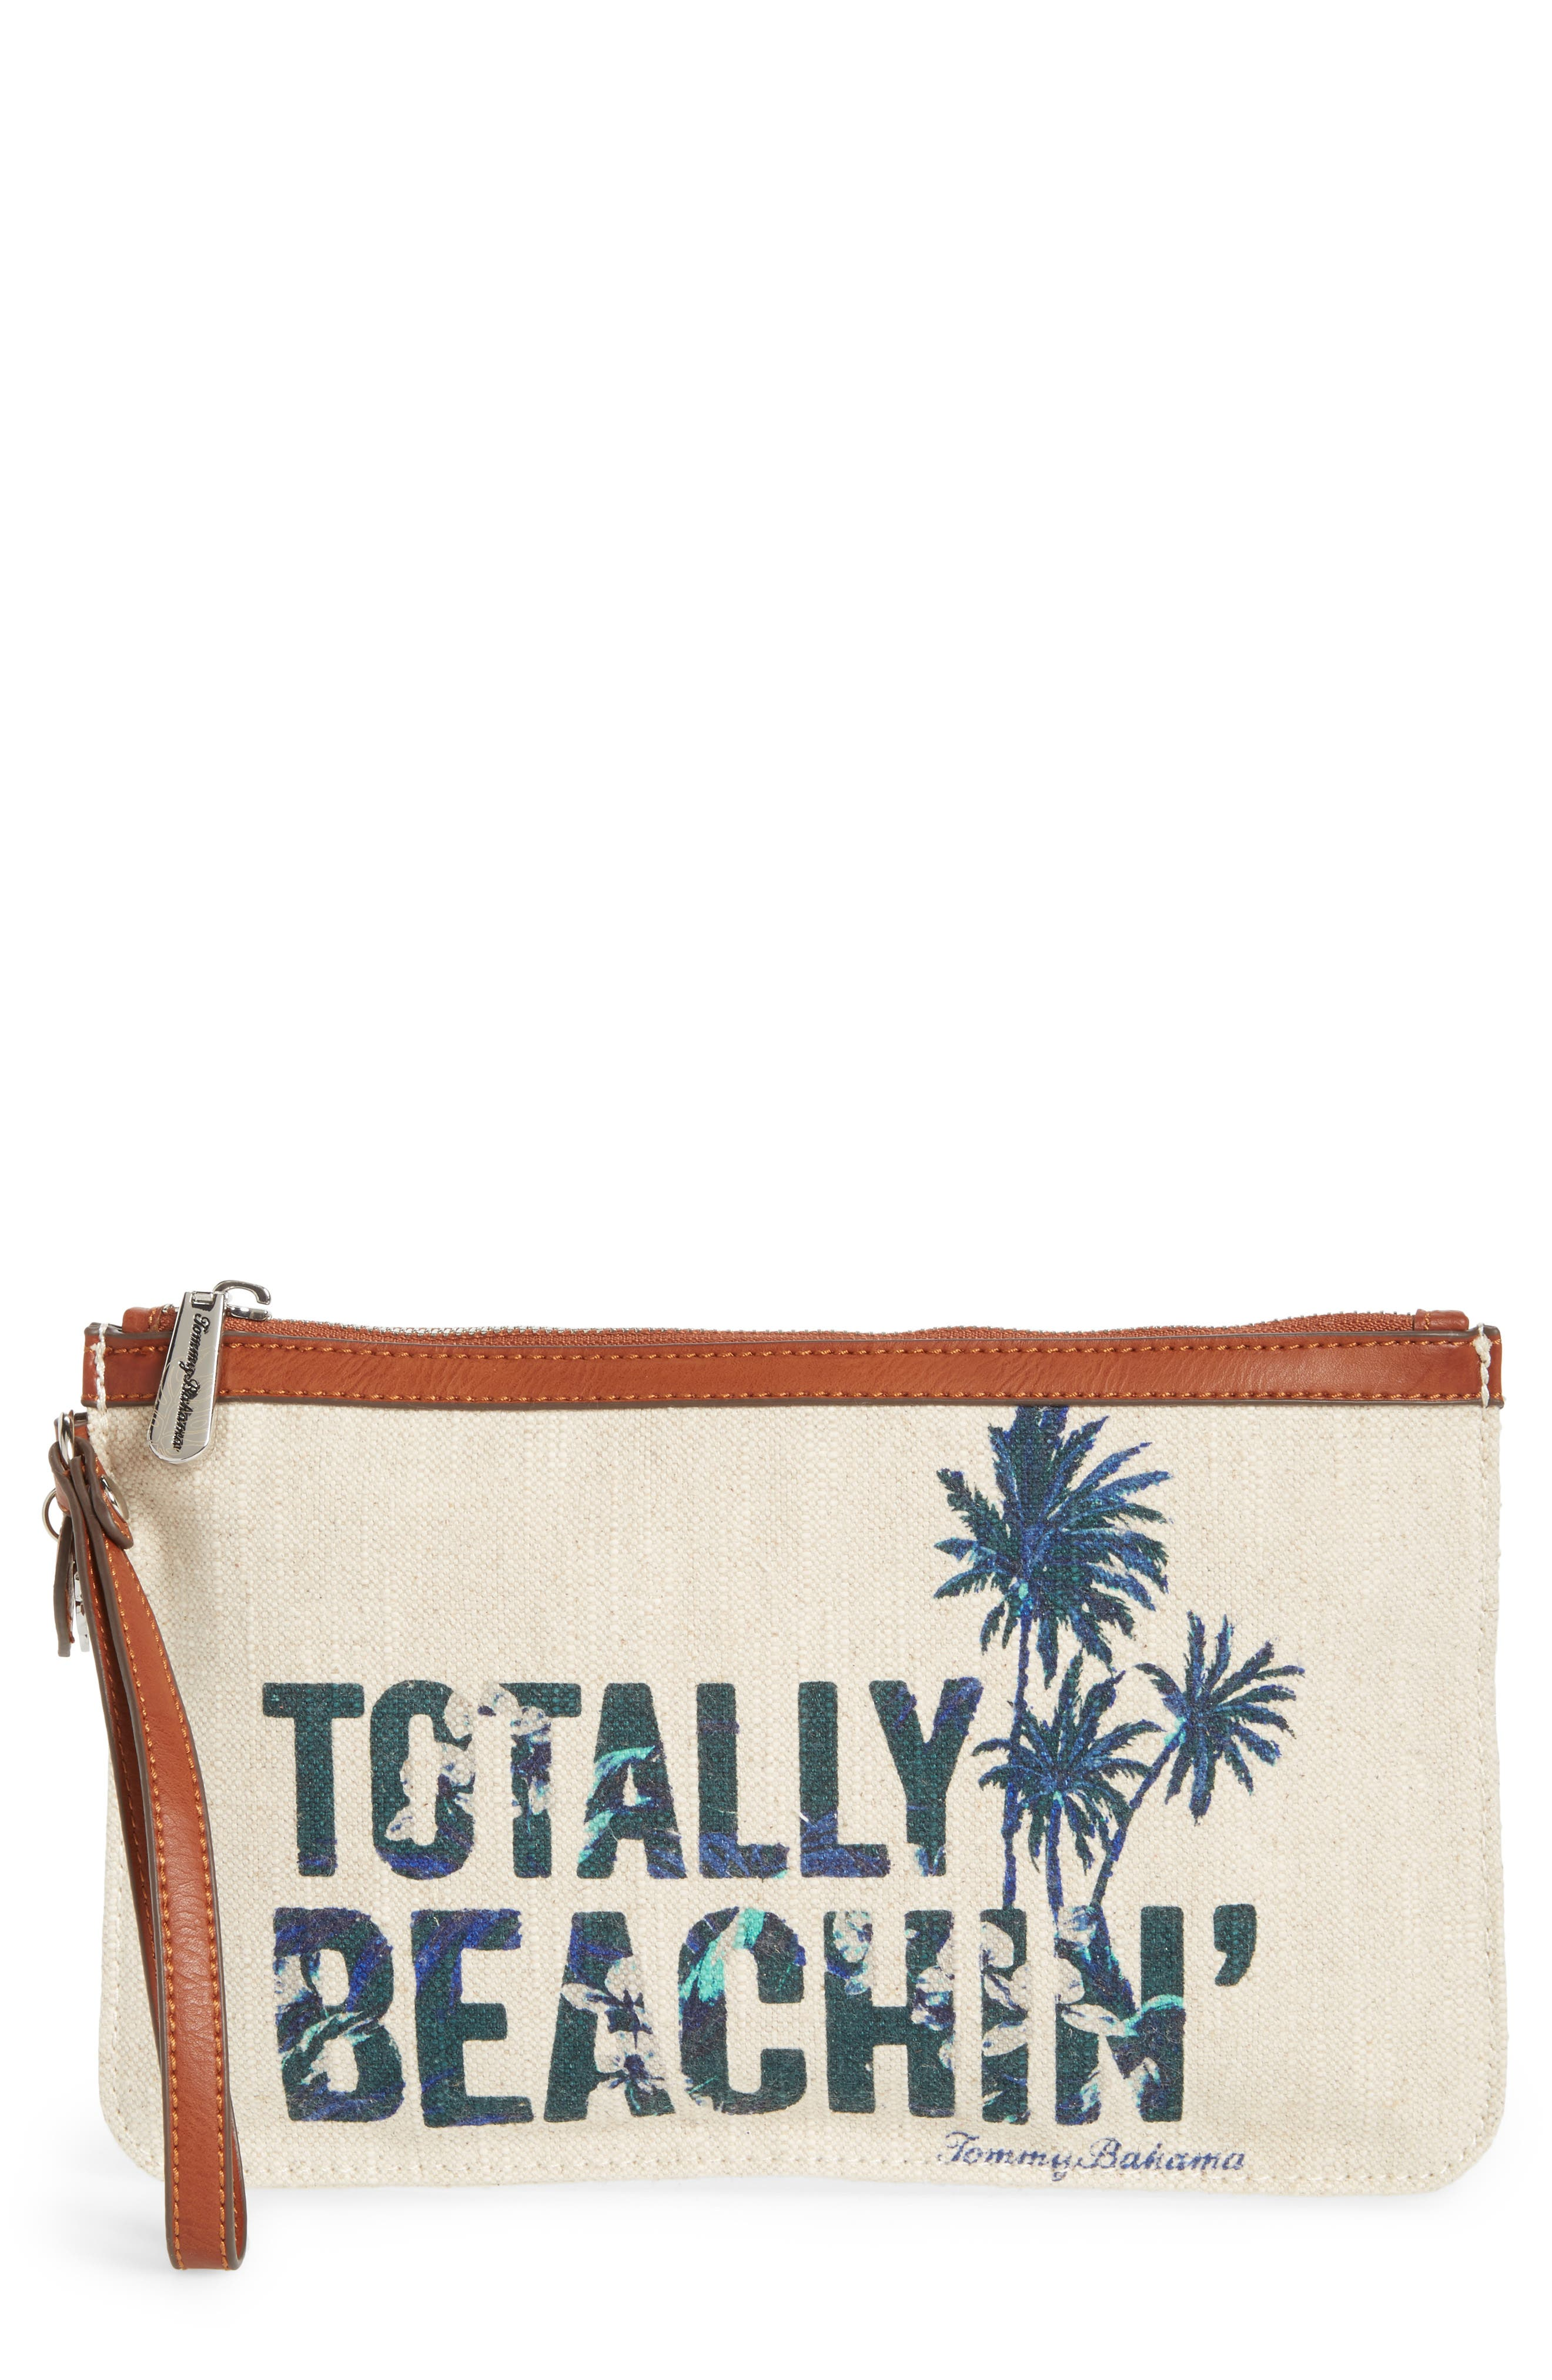 Tommy Bahama Boca Chica Beach Wristlet